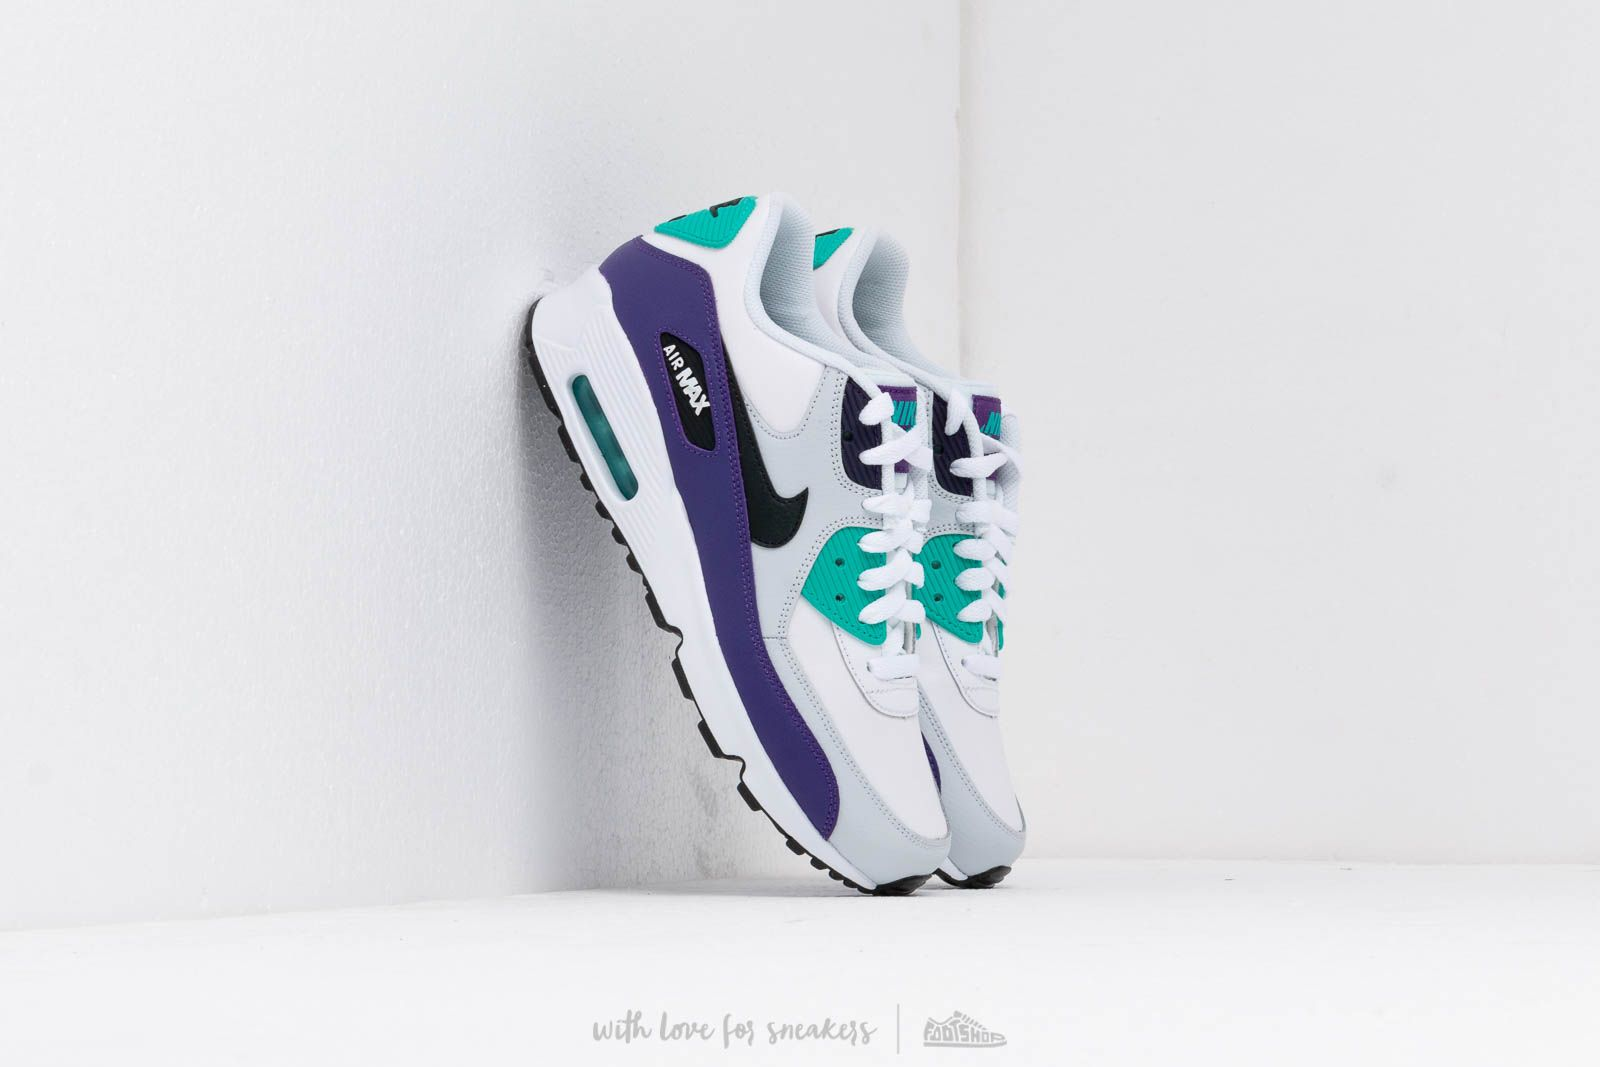 reputable site 8ce1f 7d1c4 Nike Air Max 90 Ltr (GS). White  Black-Hyper Jade-Court Purple